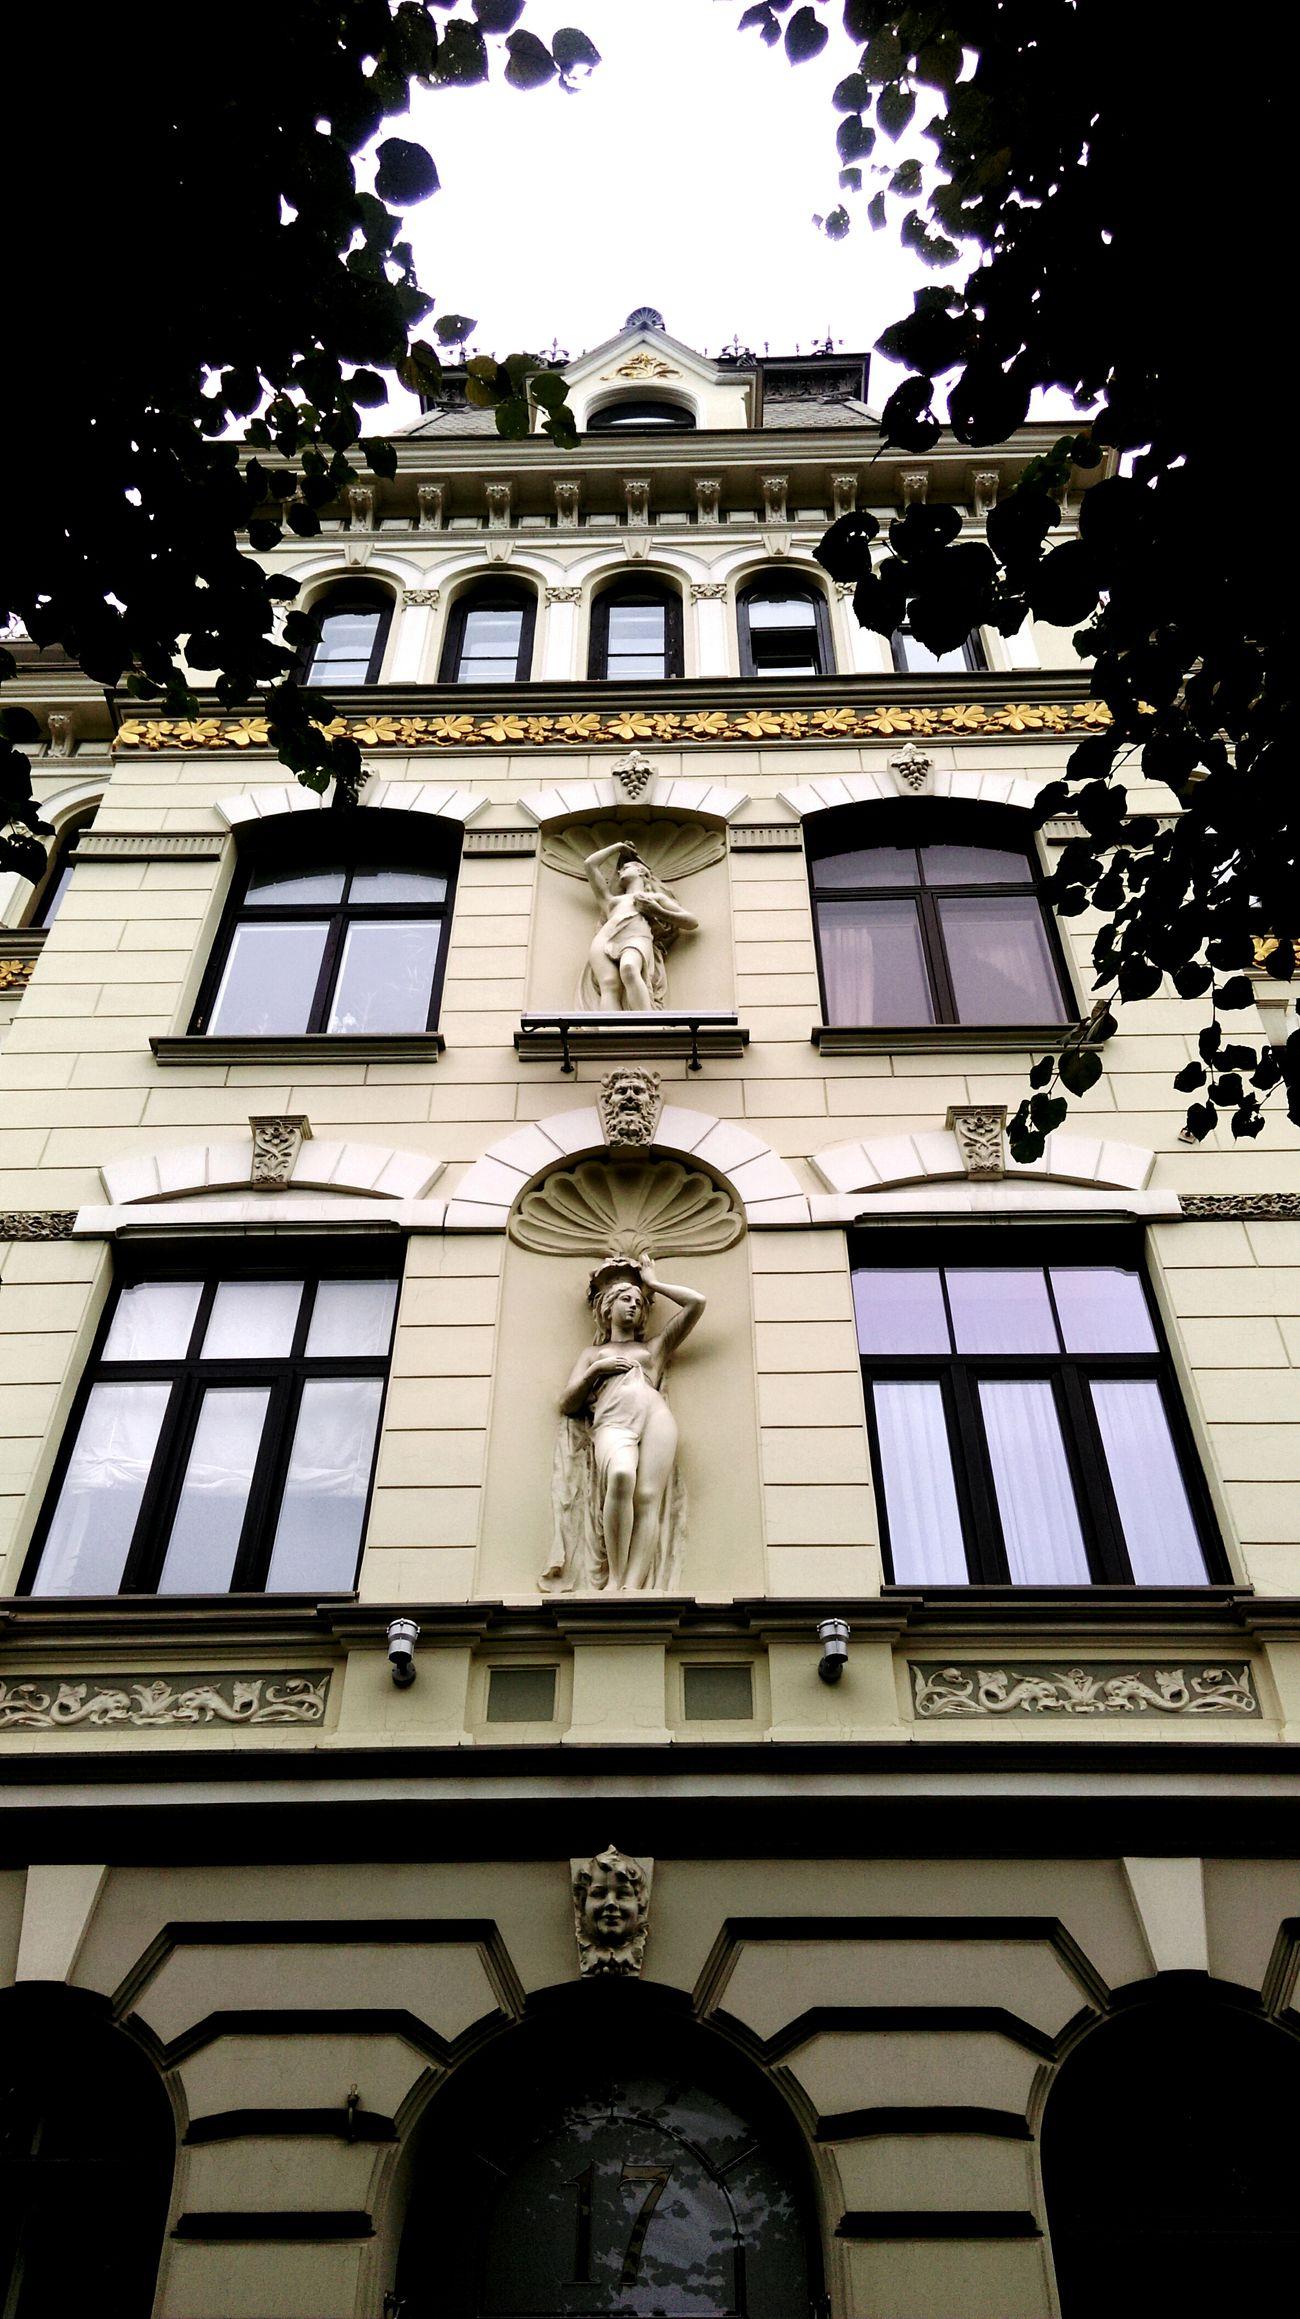 Art Nouveau Art Nouveau Architecture Art Nouveau Villa Art Nouveau Buildings Art Nouveau In Riga Riga Riga Latvia Rigaphotos Rigaphotography Lettland  Latvia Riga